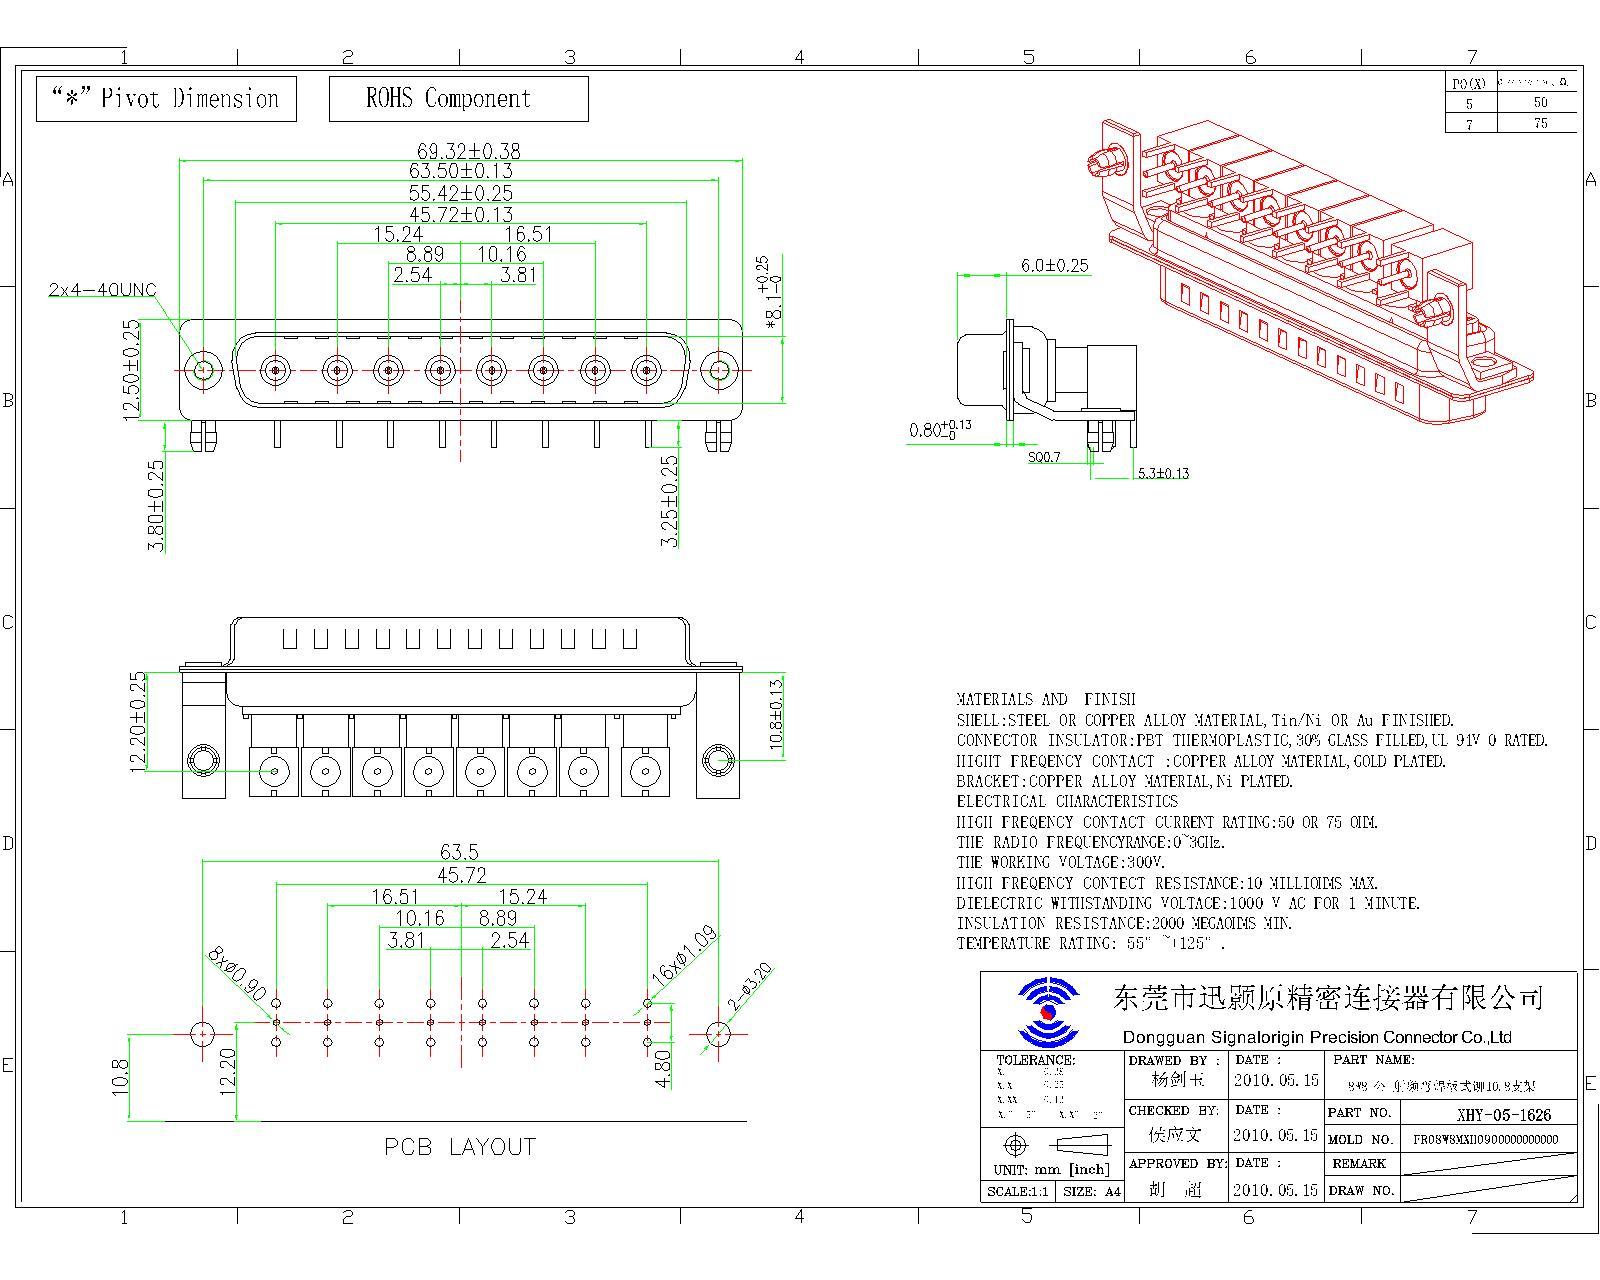 8 Receptacle DCM8W8SNA197 0 Contacts Combo D DM Series DC-8W8 DCM8W8SNA197 Combination Layout D Sub Connector